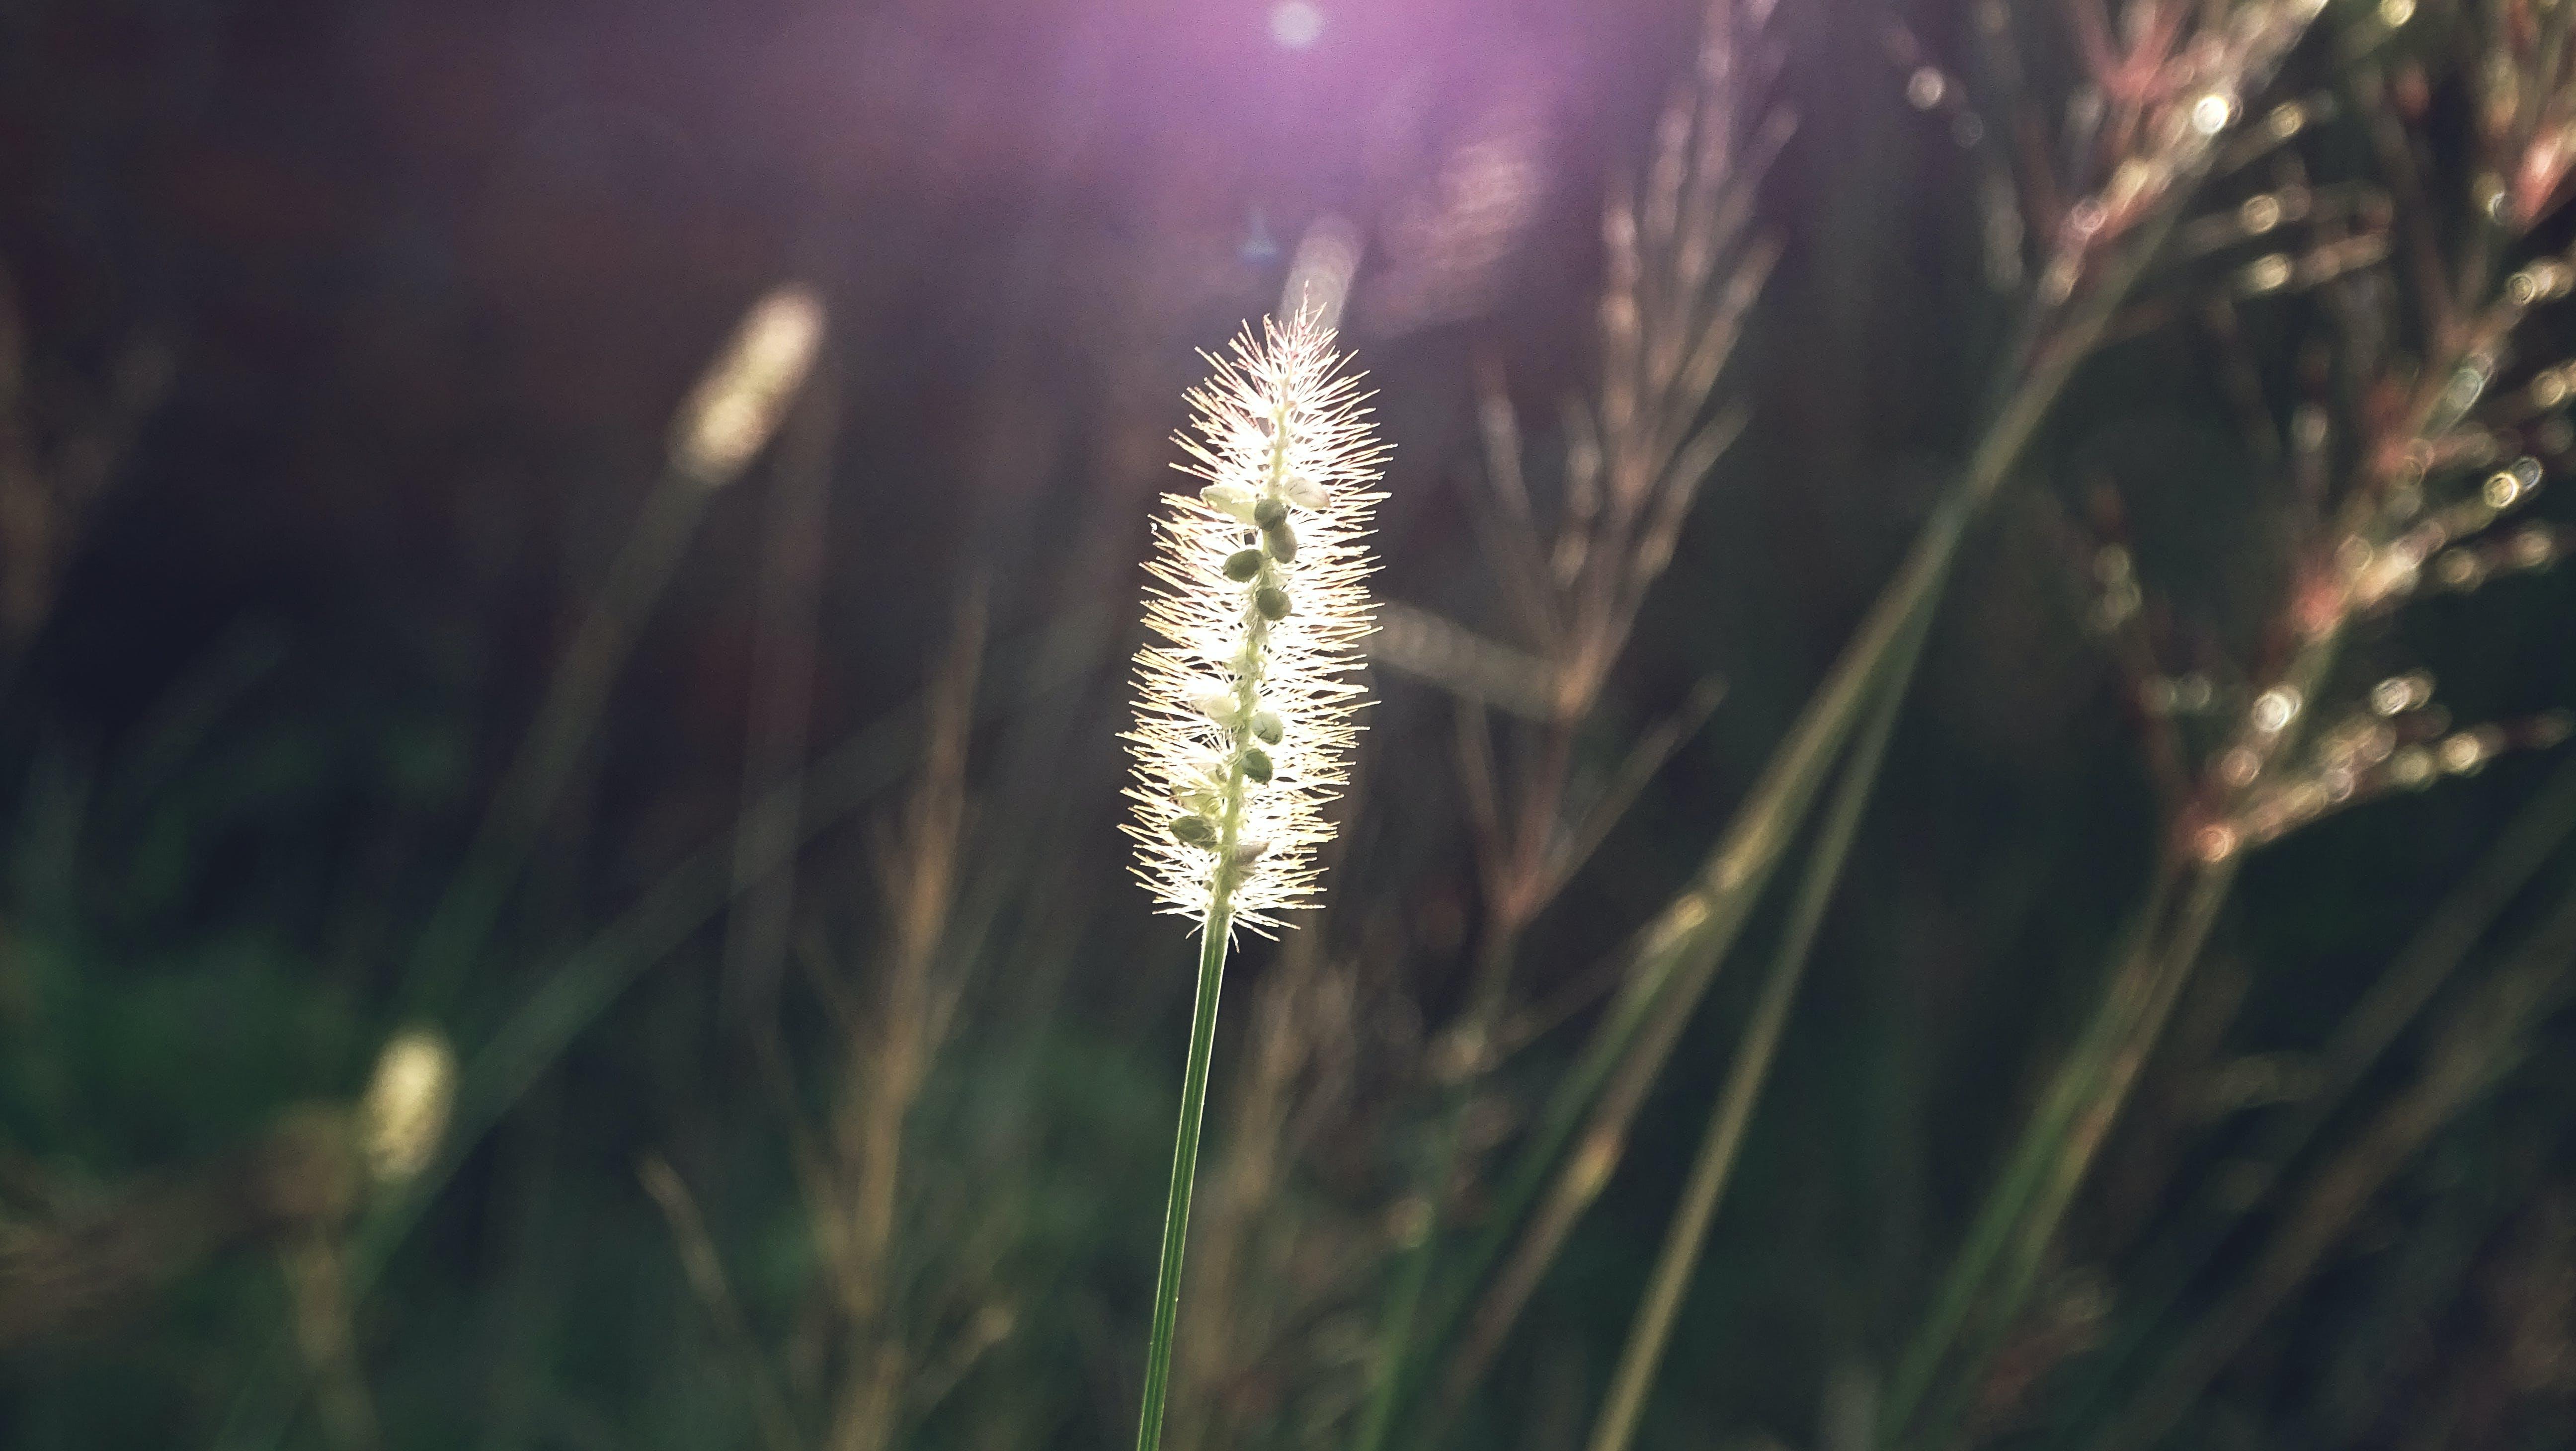 Free stock photo of bristle grass, close up, focus, grass